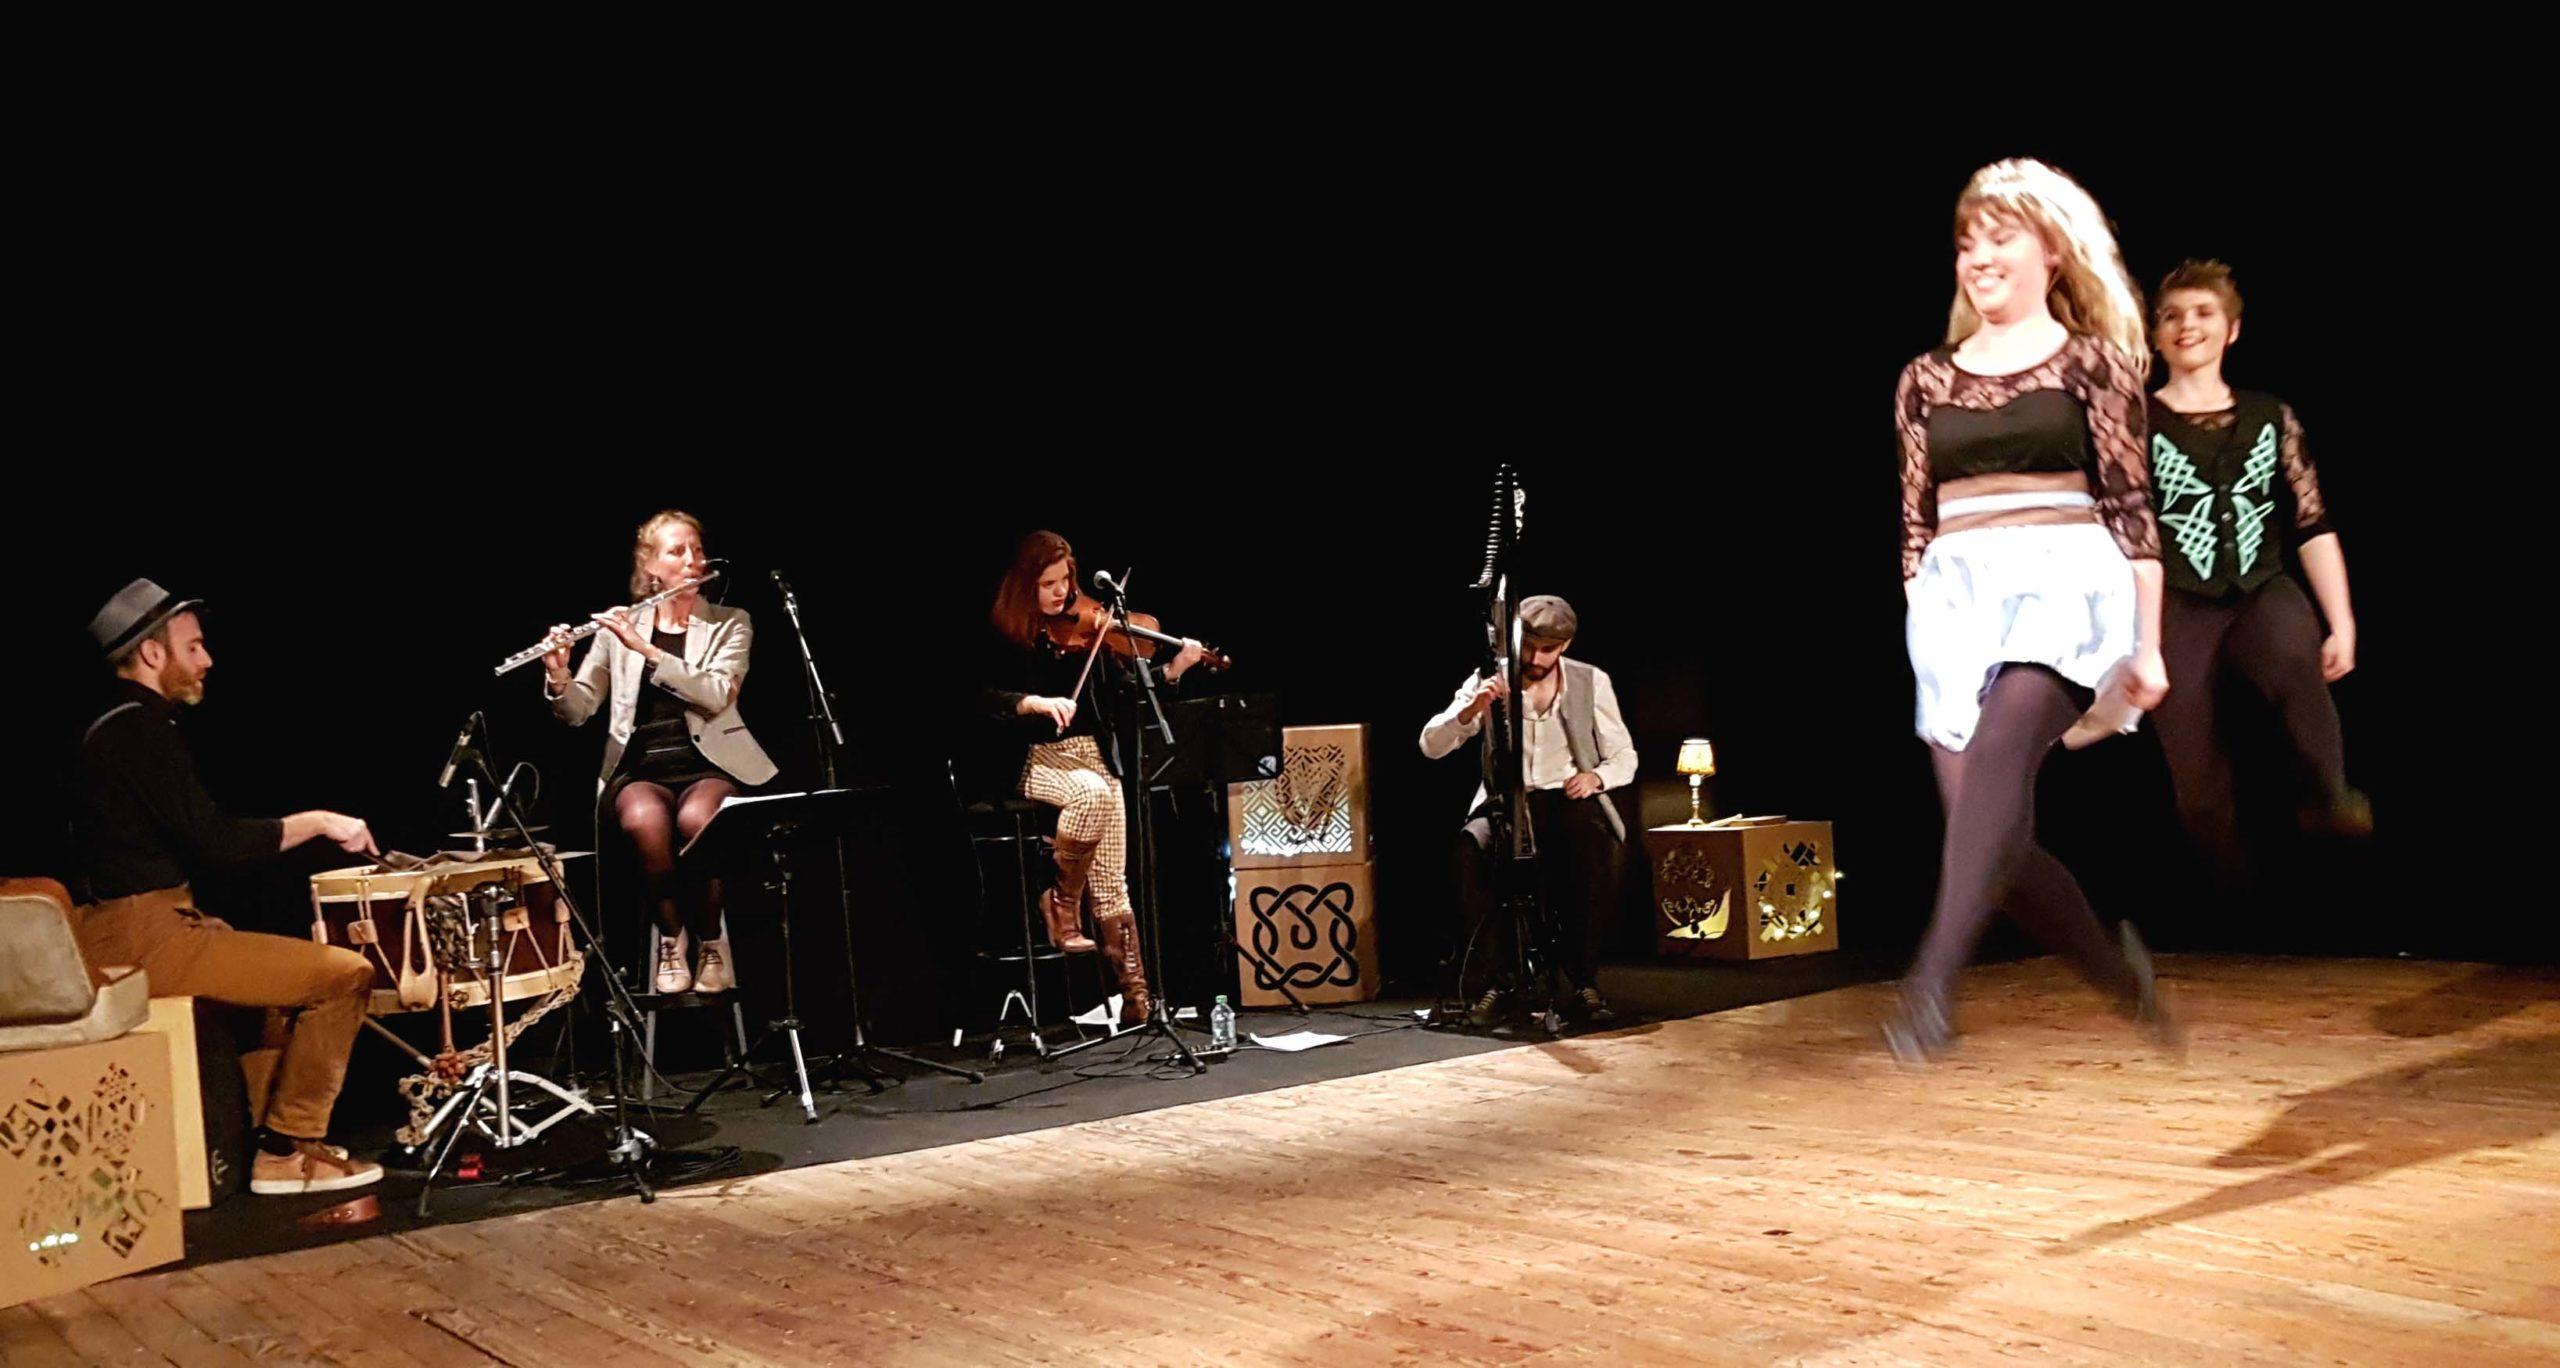 Danse irlandaise Spectacle What's the Craic? Ghillie's groupe de musique Irish and Folk music. Crédit: la charpente Fred